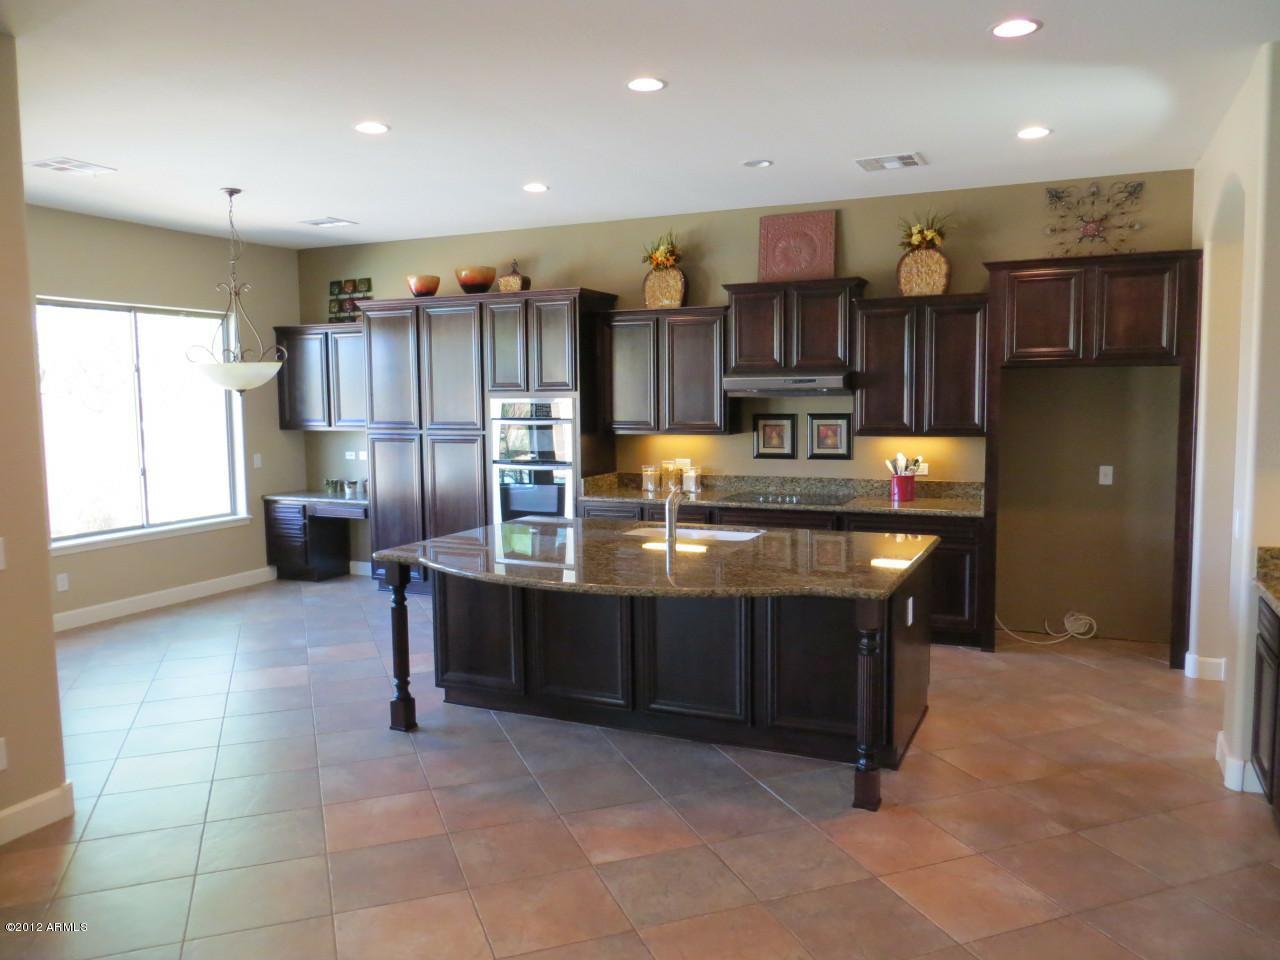 32307 N 18th Avenue, Phoenix, AZ 85085 (MLS #4802096) :: The Daniel Montez Real Estate Group